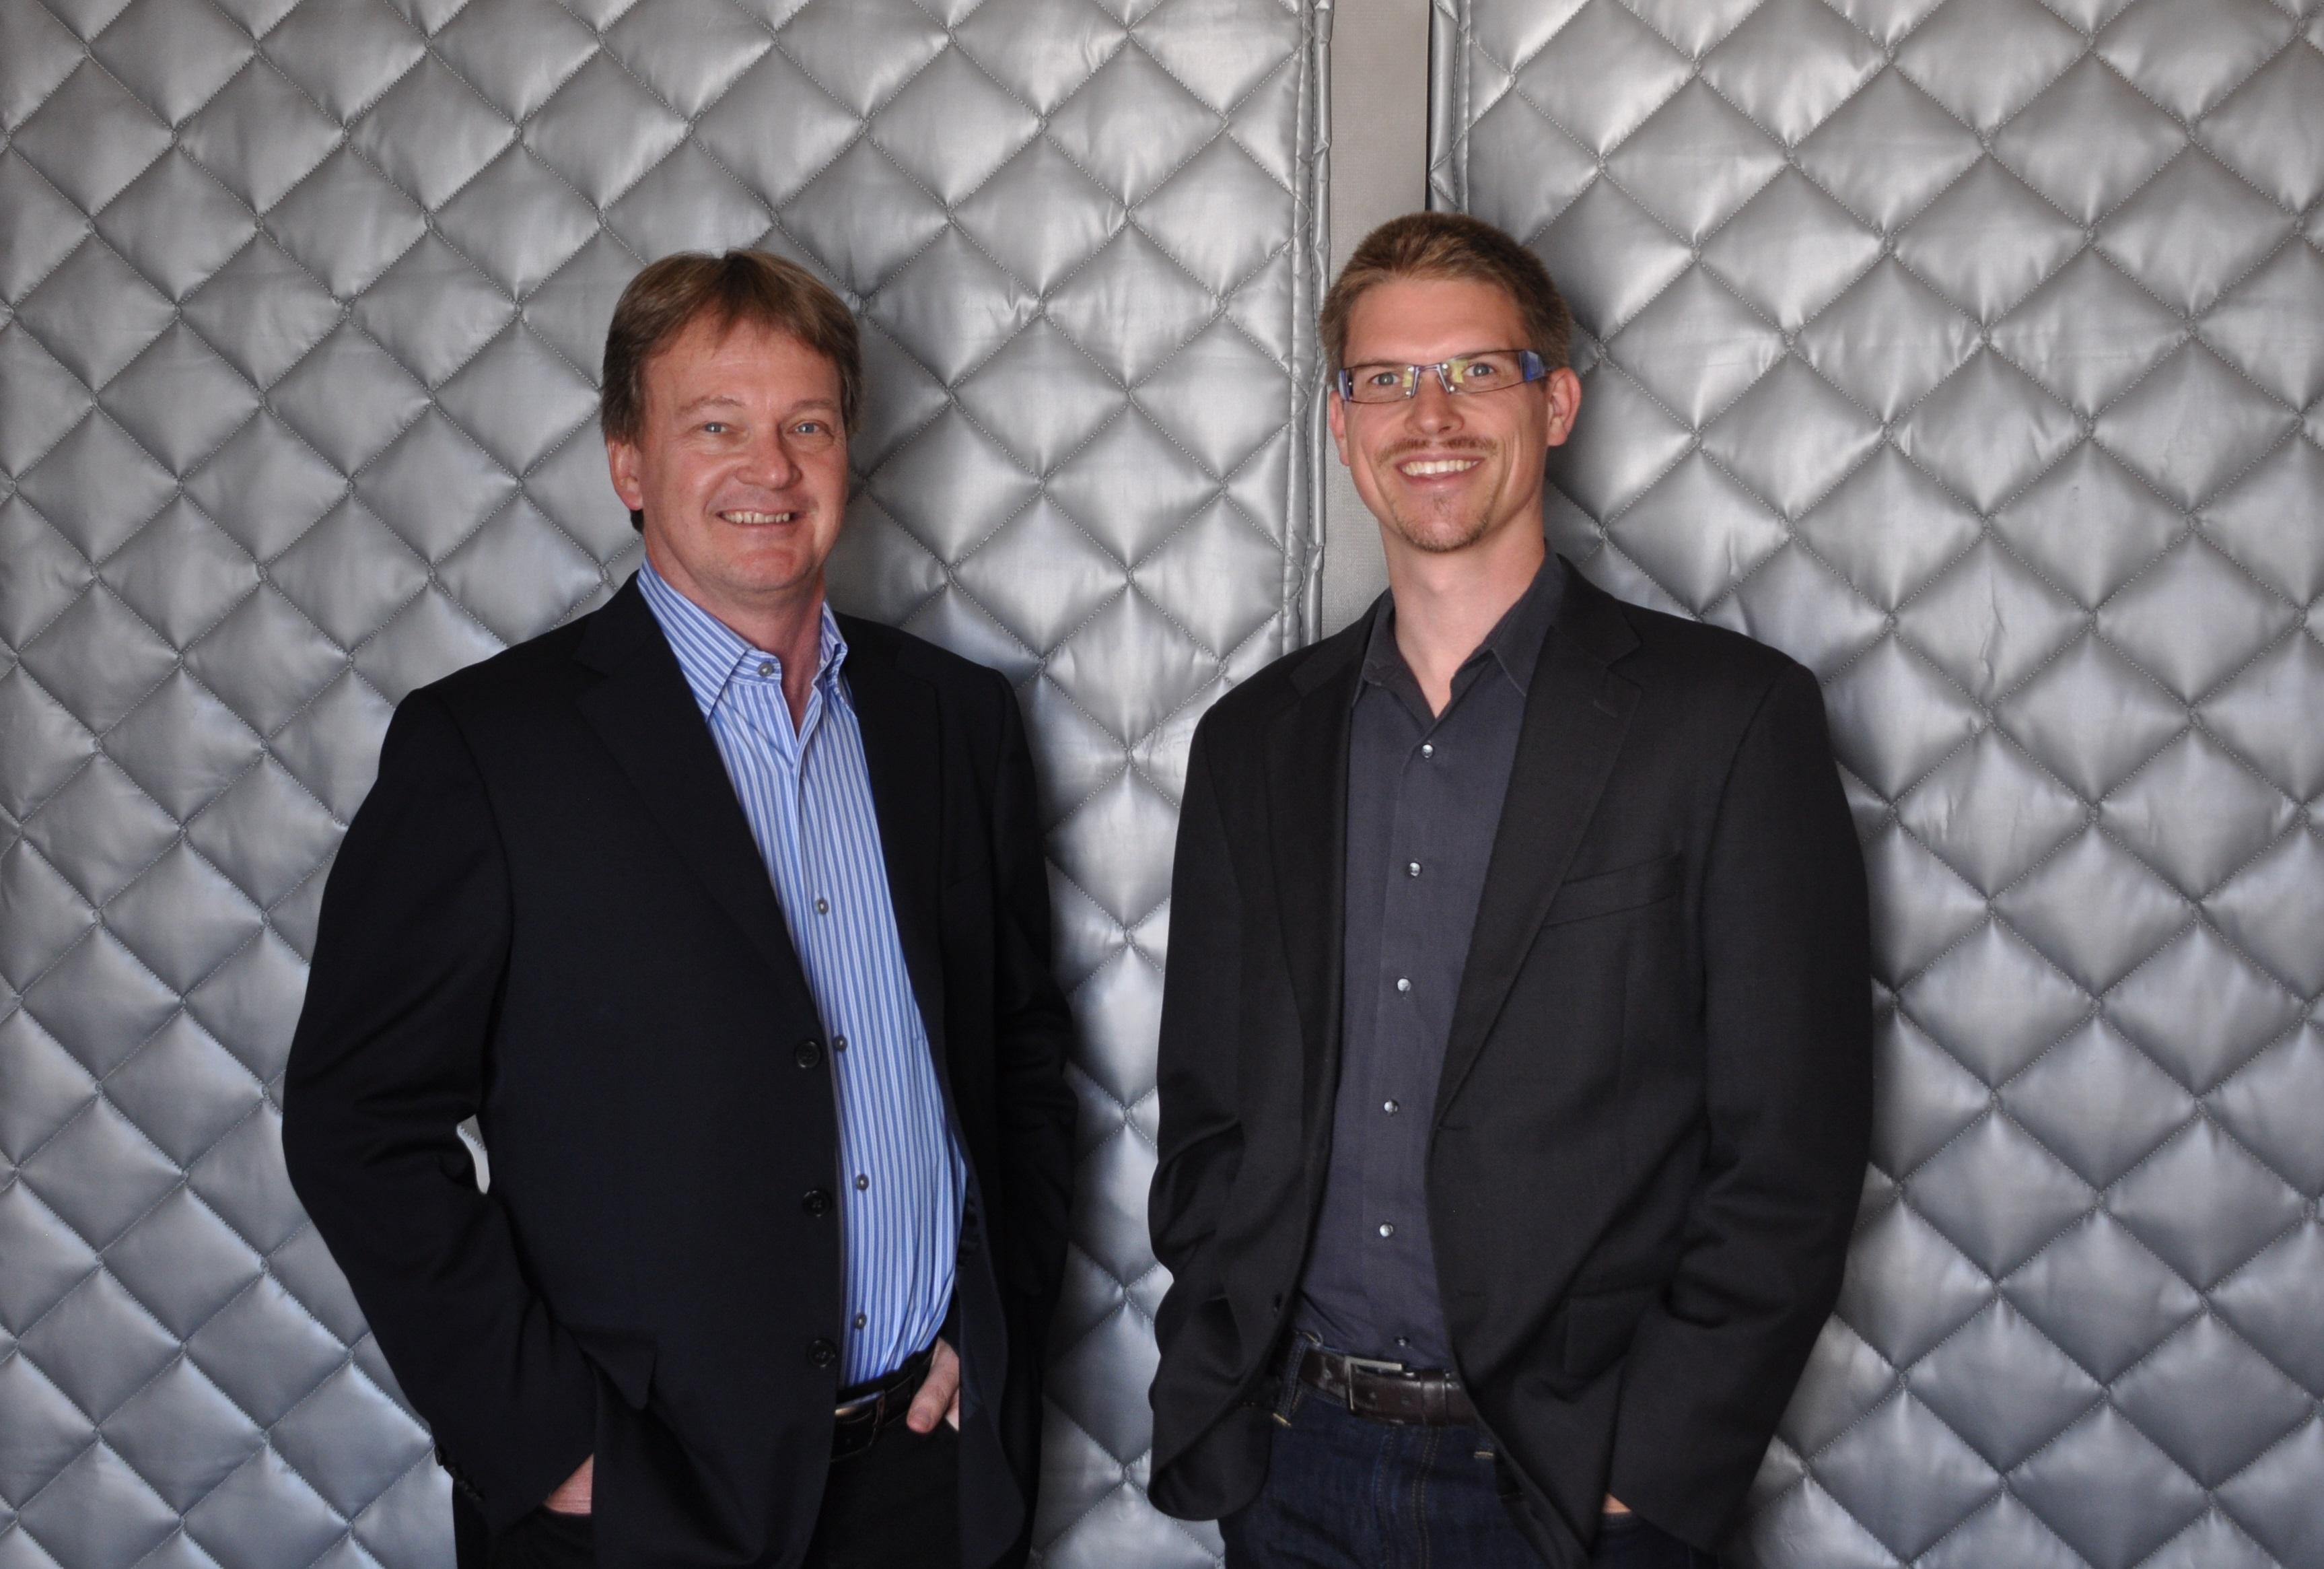 Nebula's new CEO Gordon Stitt and founder Chris Kemp.